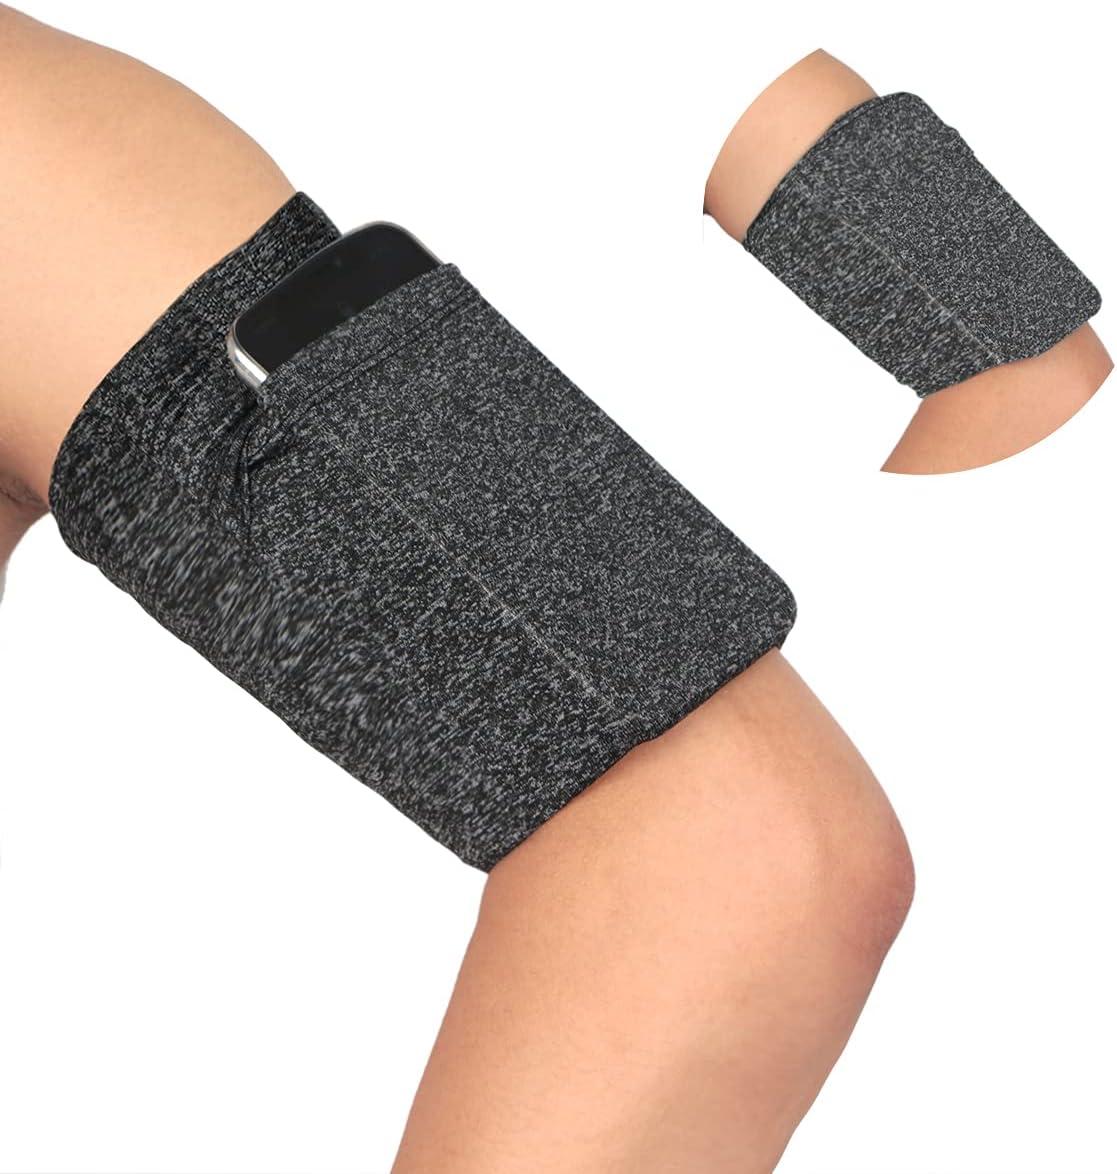 Armband Wristband for Cellphone Key Large discharge sale Airpod Arm Hol Sleeve Band San Diego Mall -